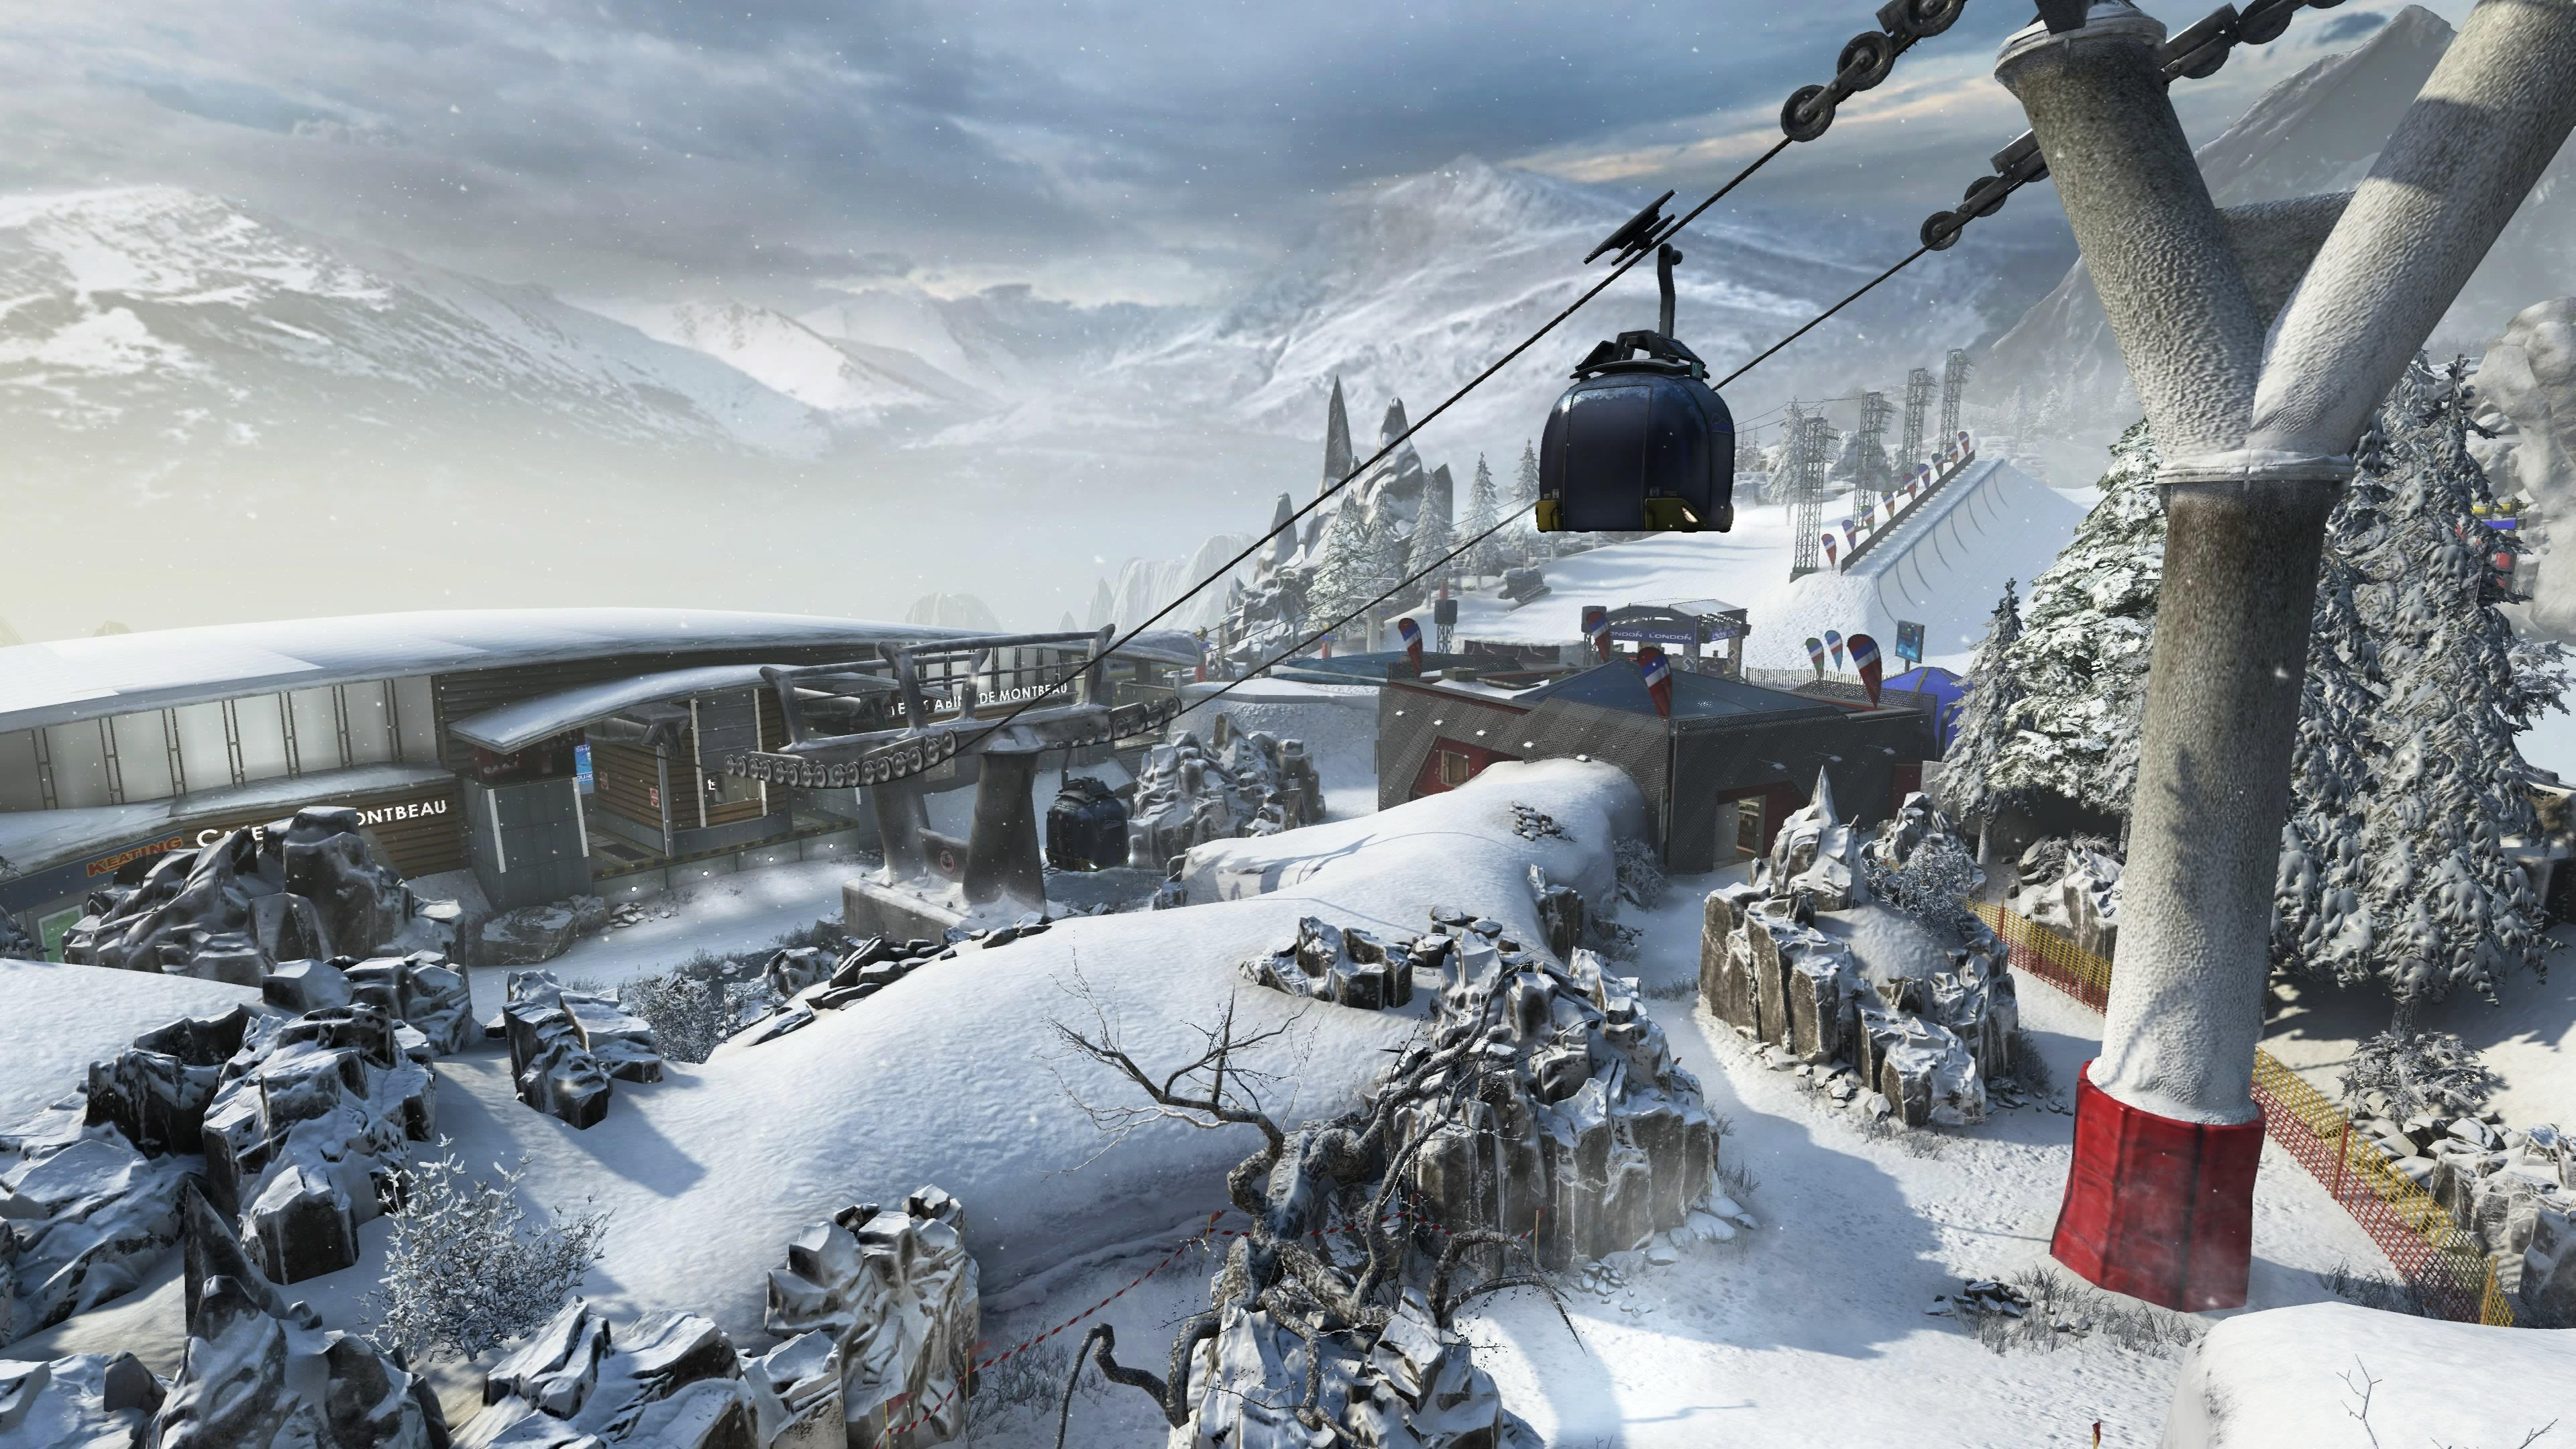 ski lift skiing snowboarding - photo #29